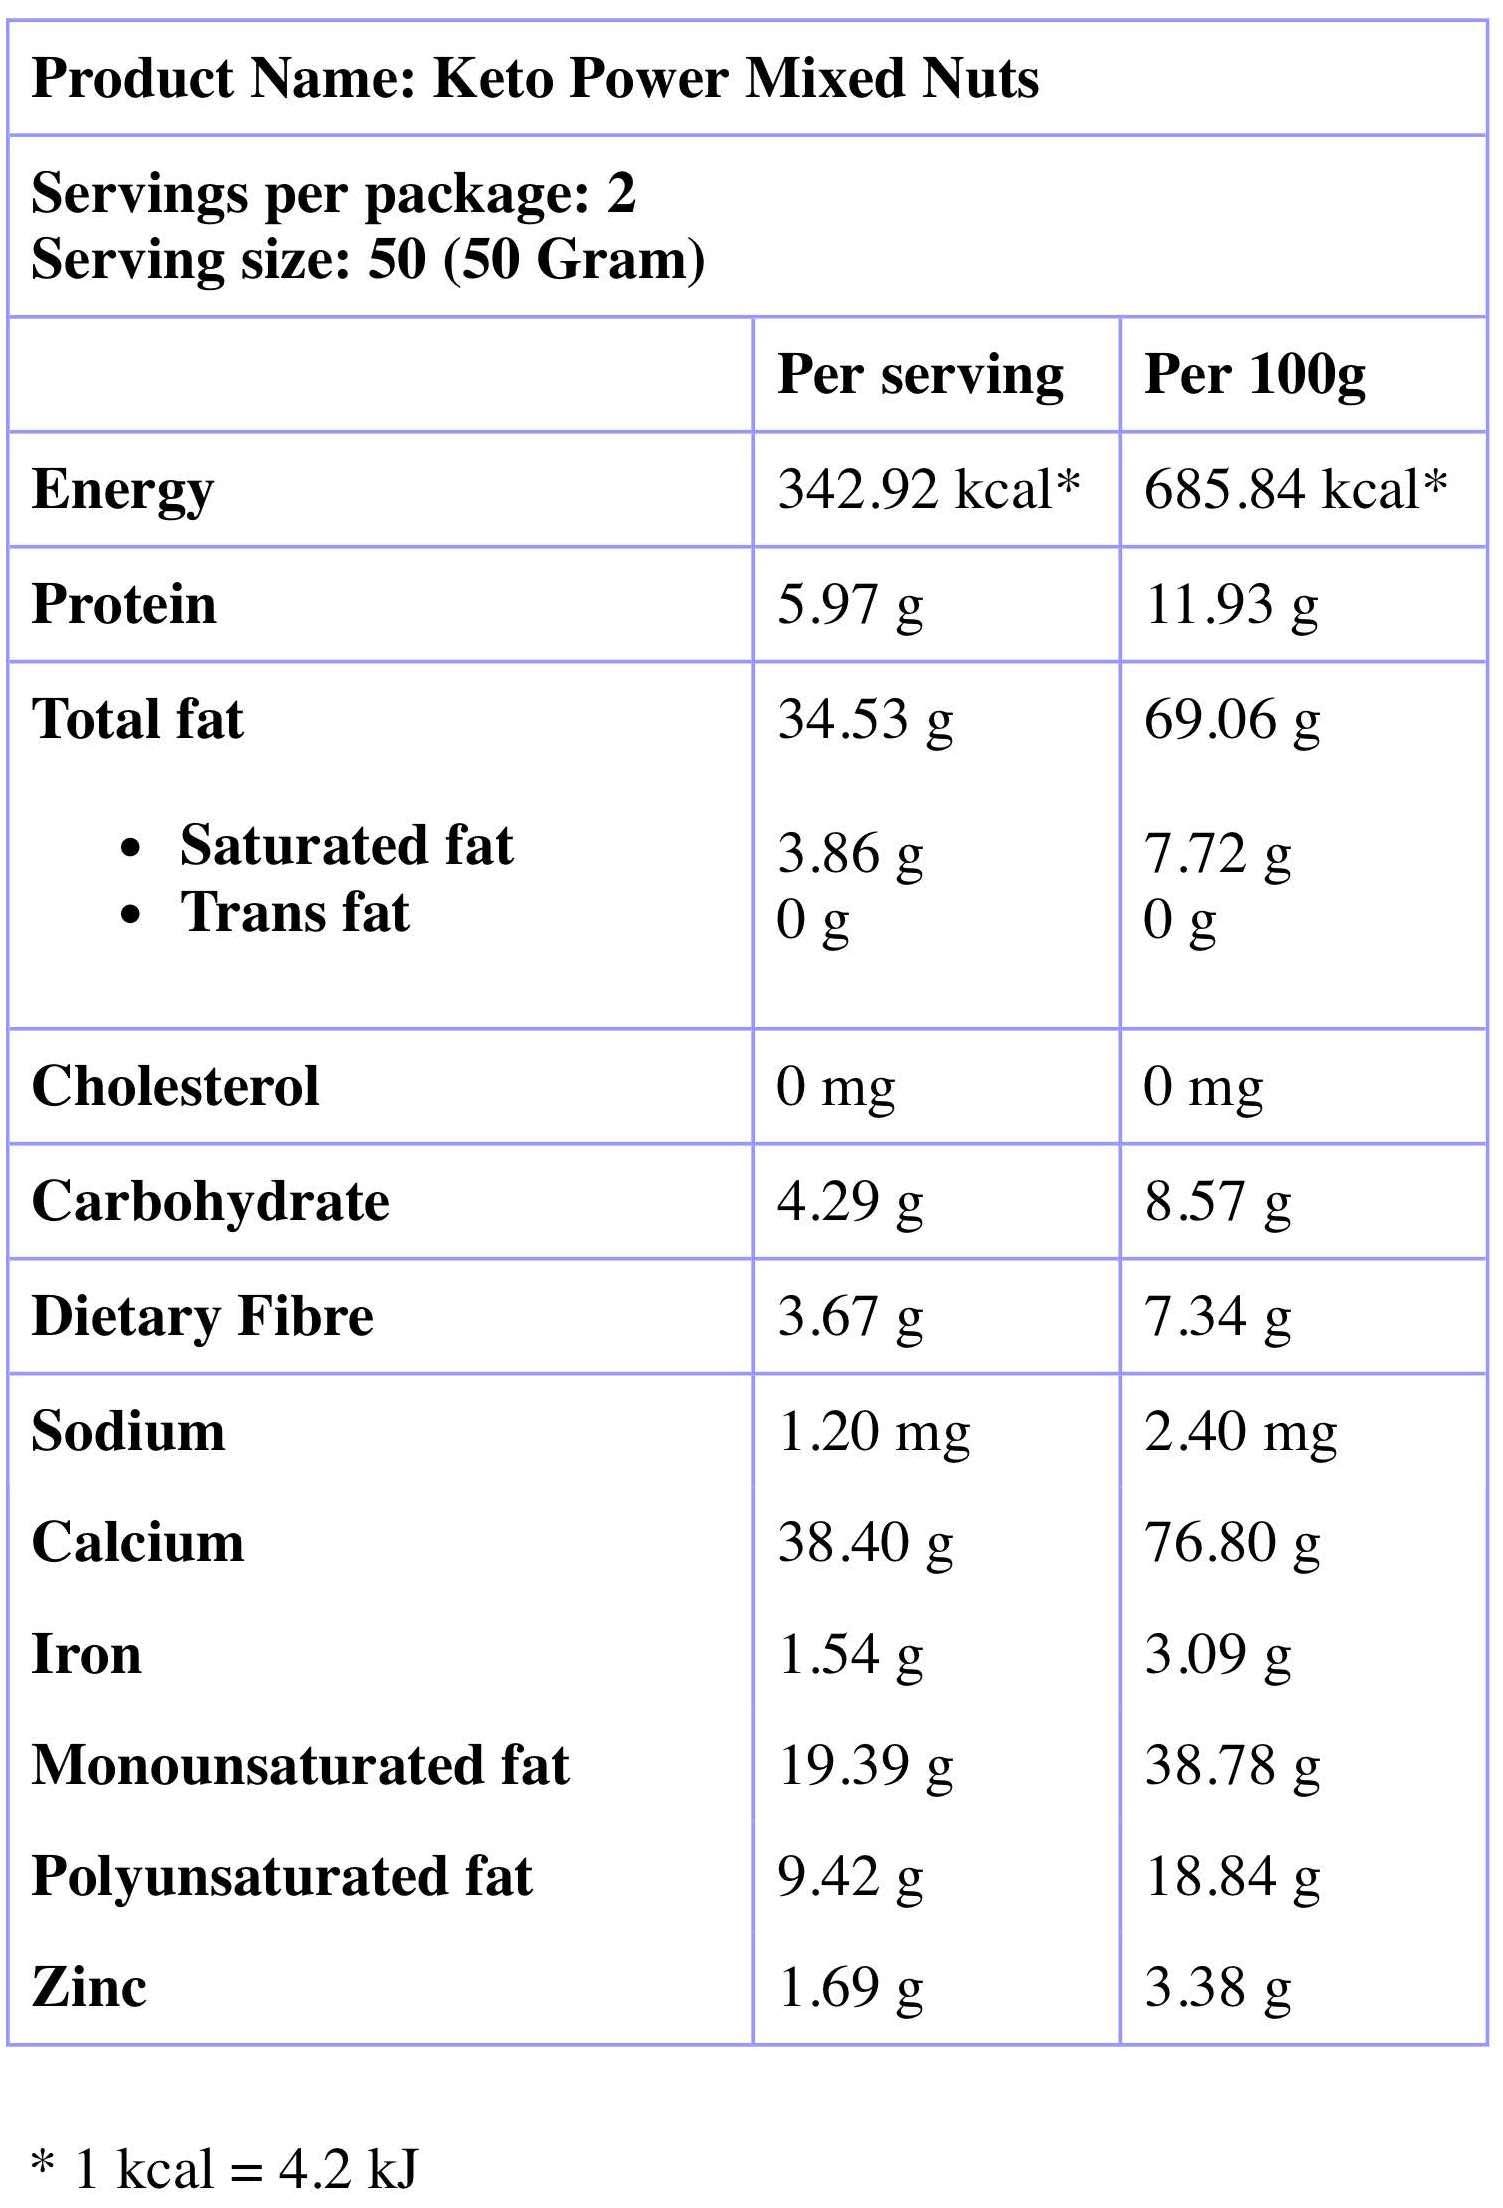 Keto Power Nutrition Information